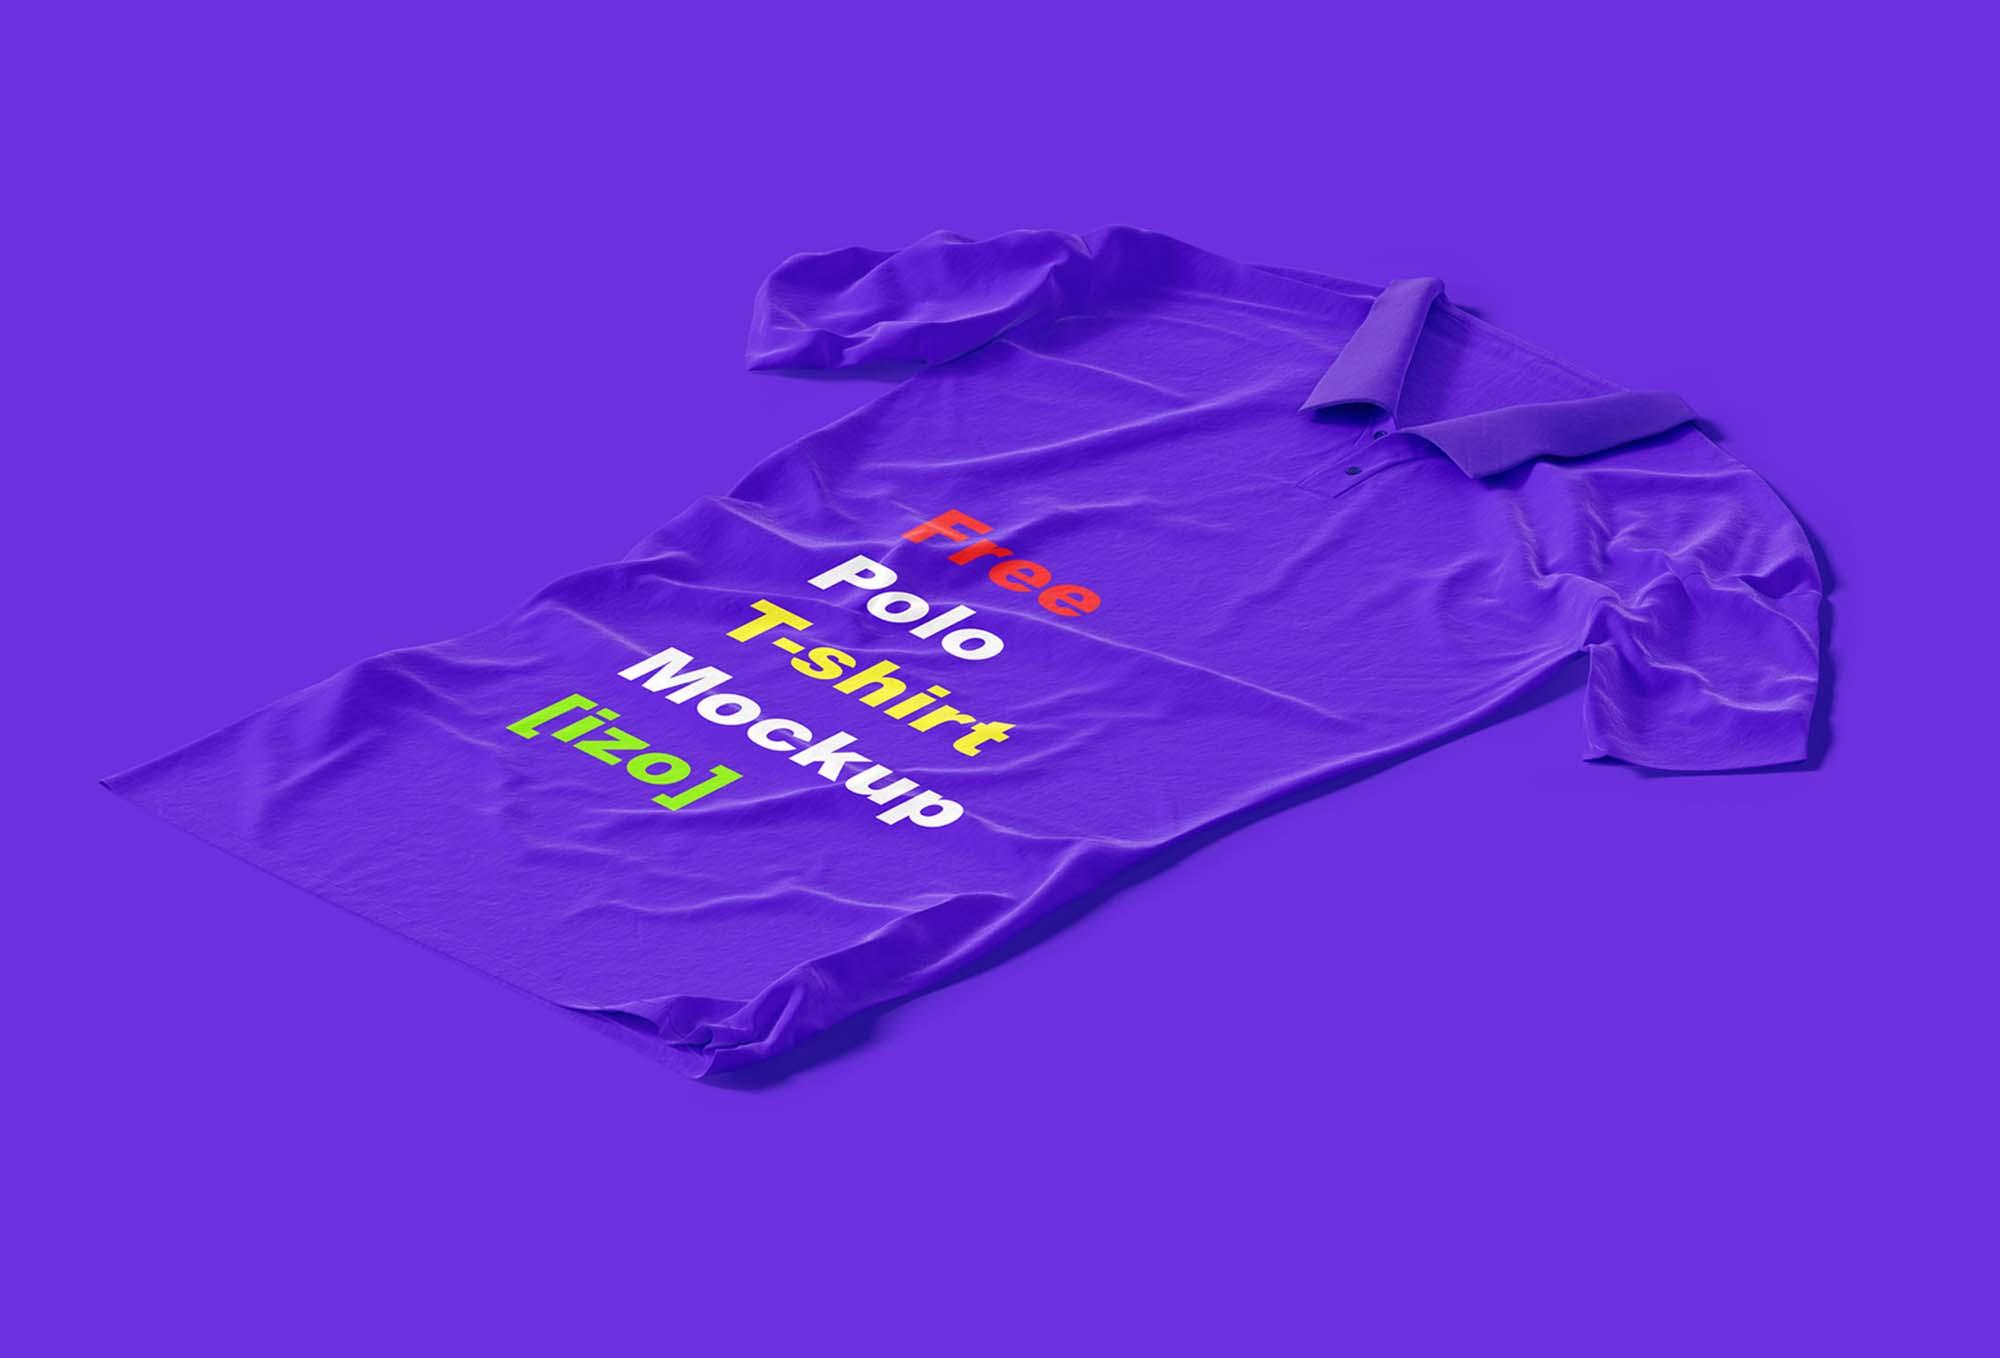 Polo T-shirt Mockup 1